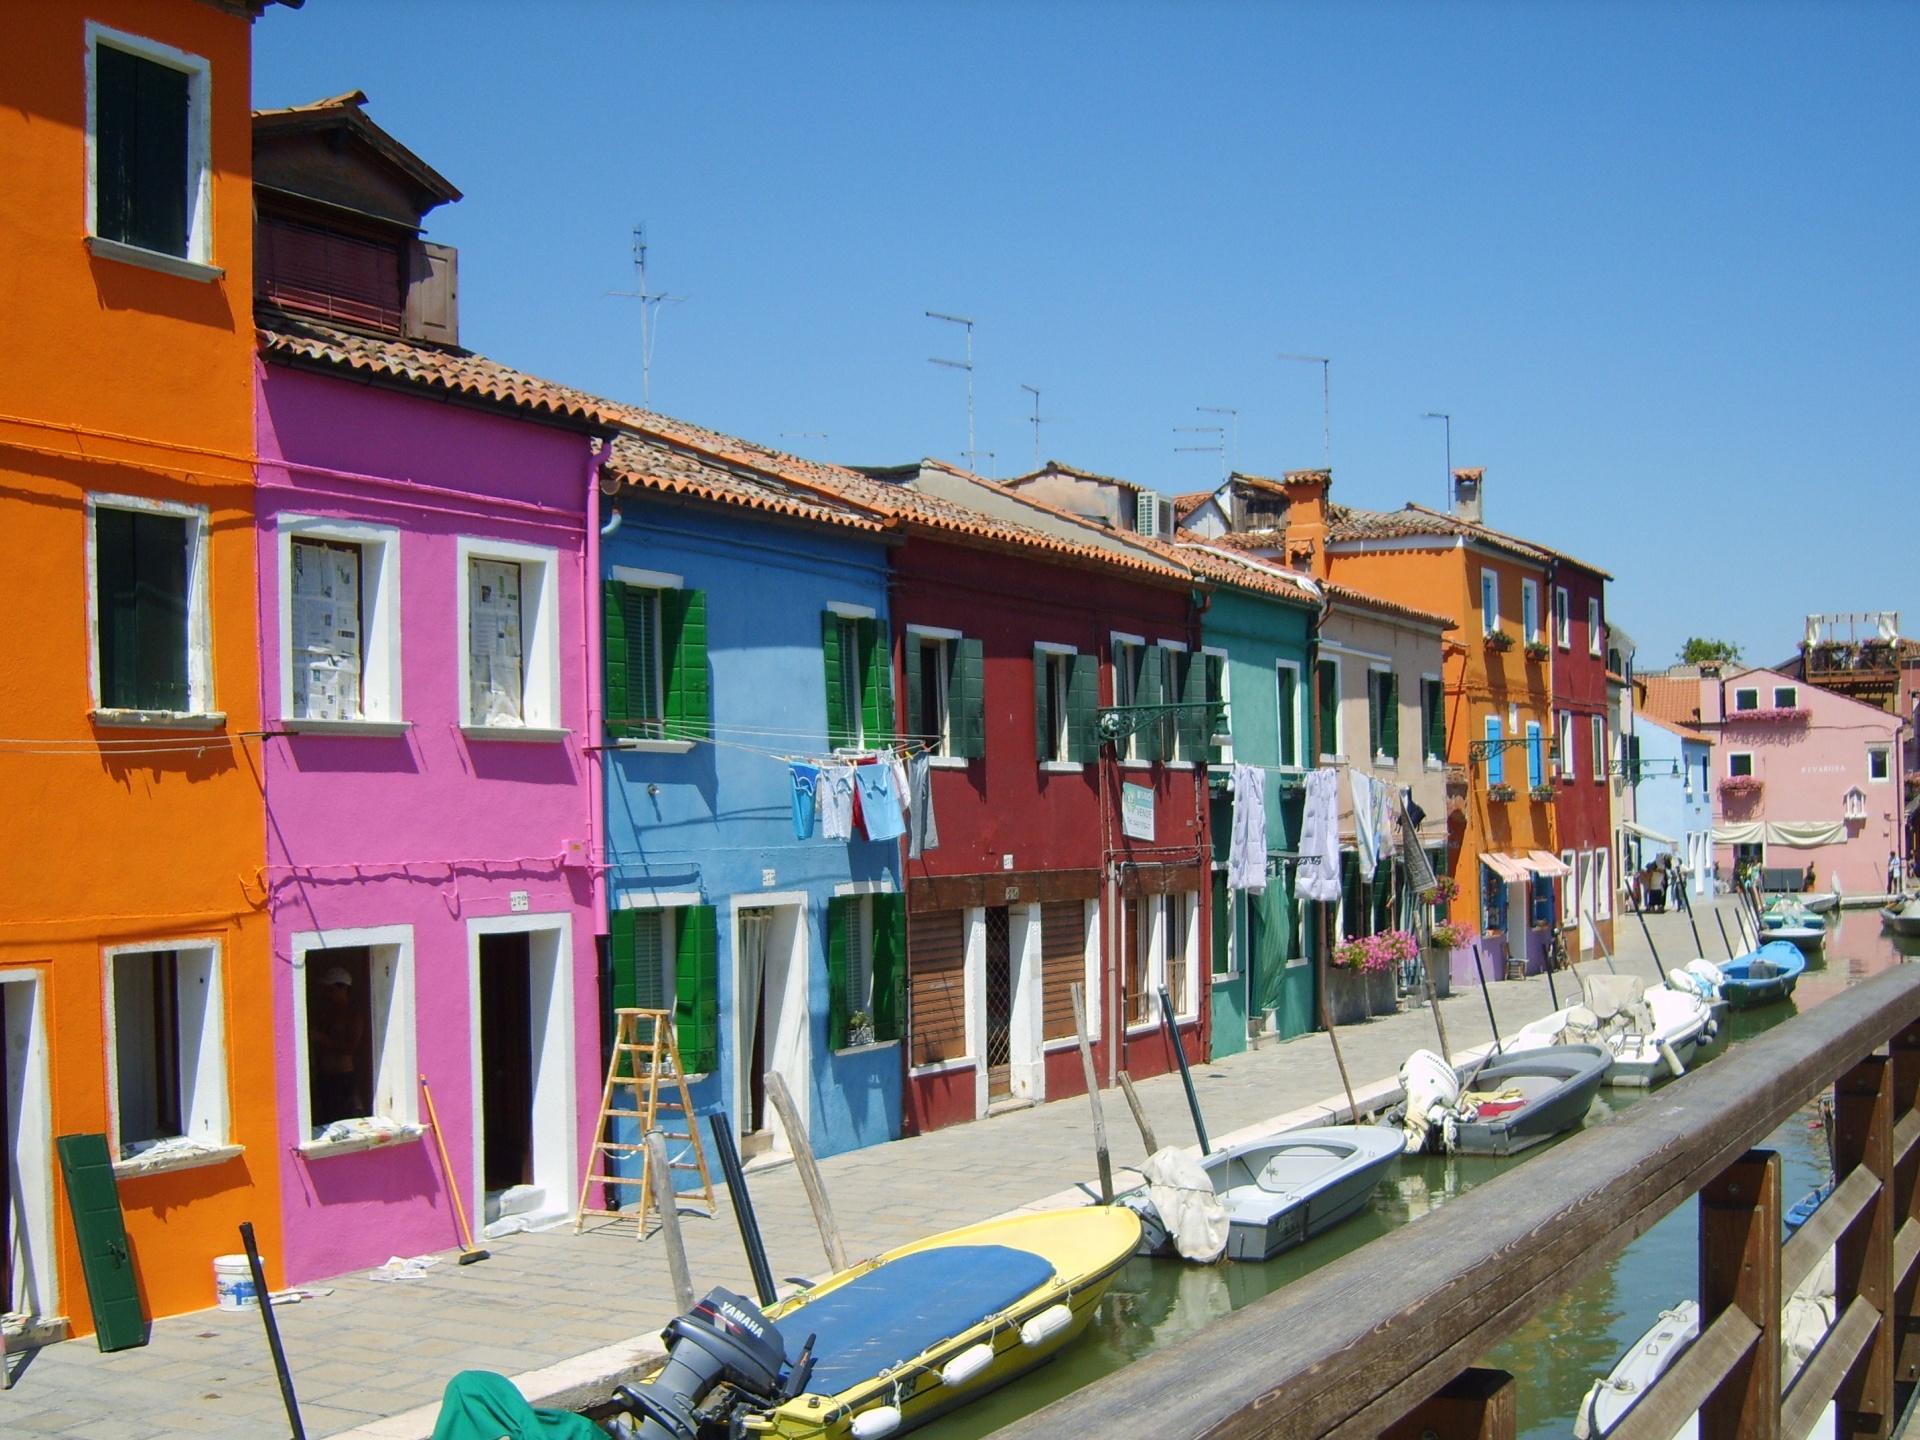 Venedig Hintergrundbilder Venedig frei fotos 1920x1440